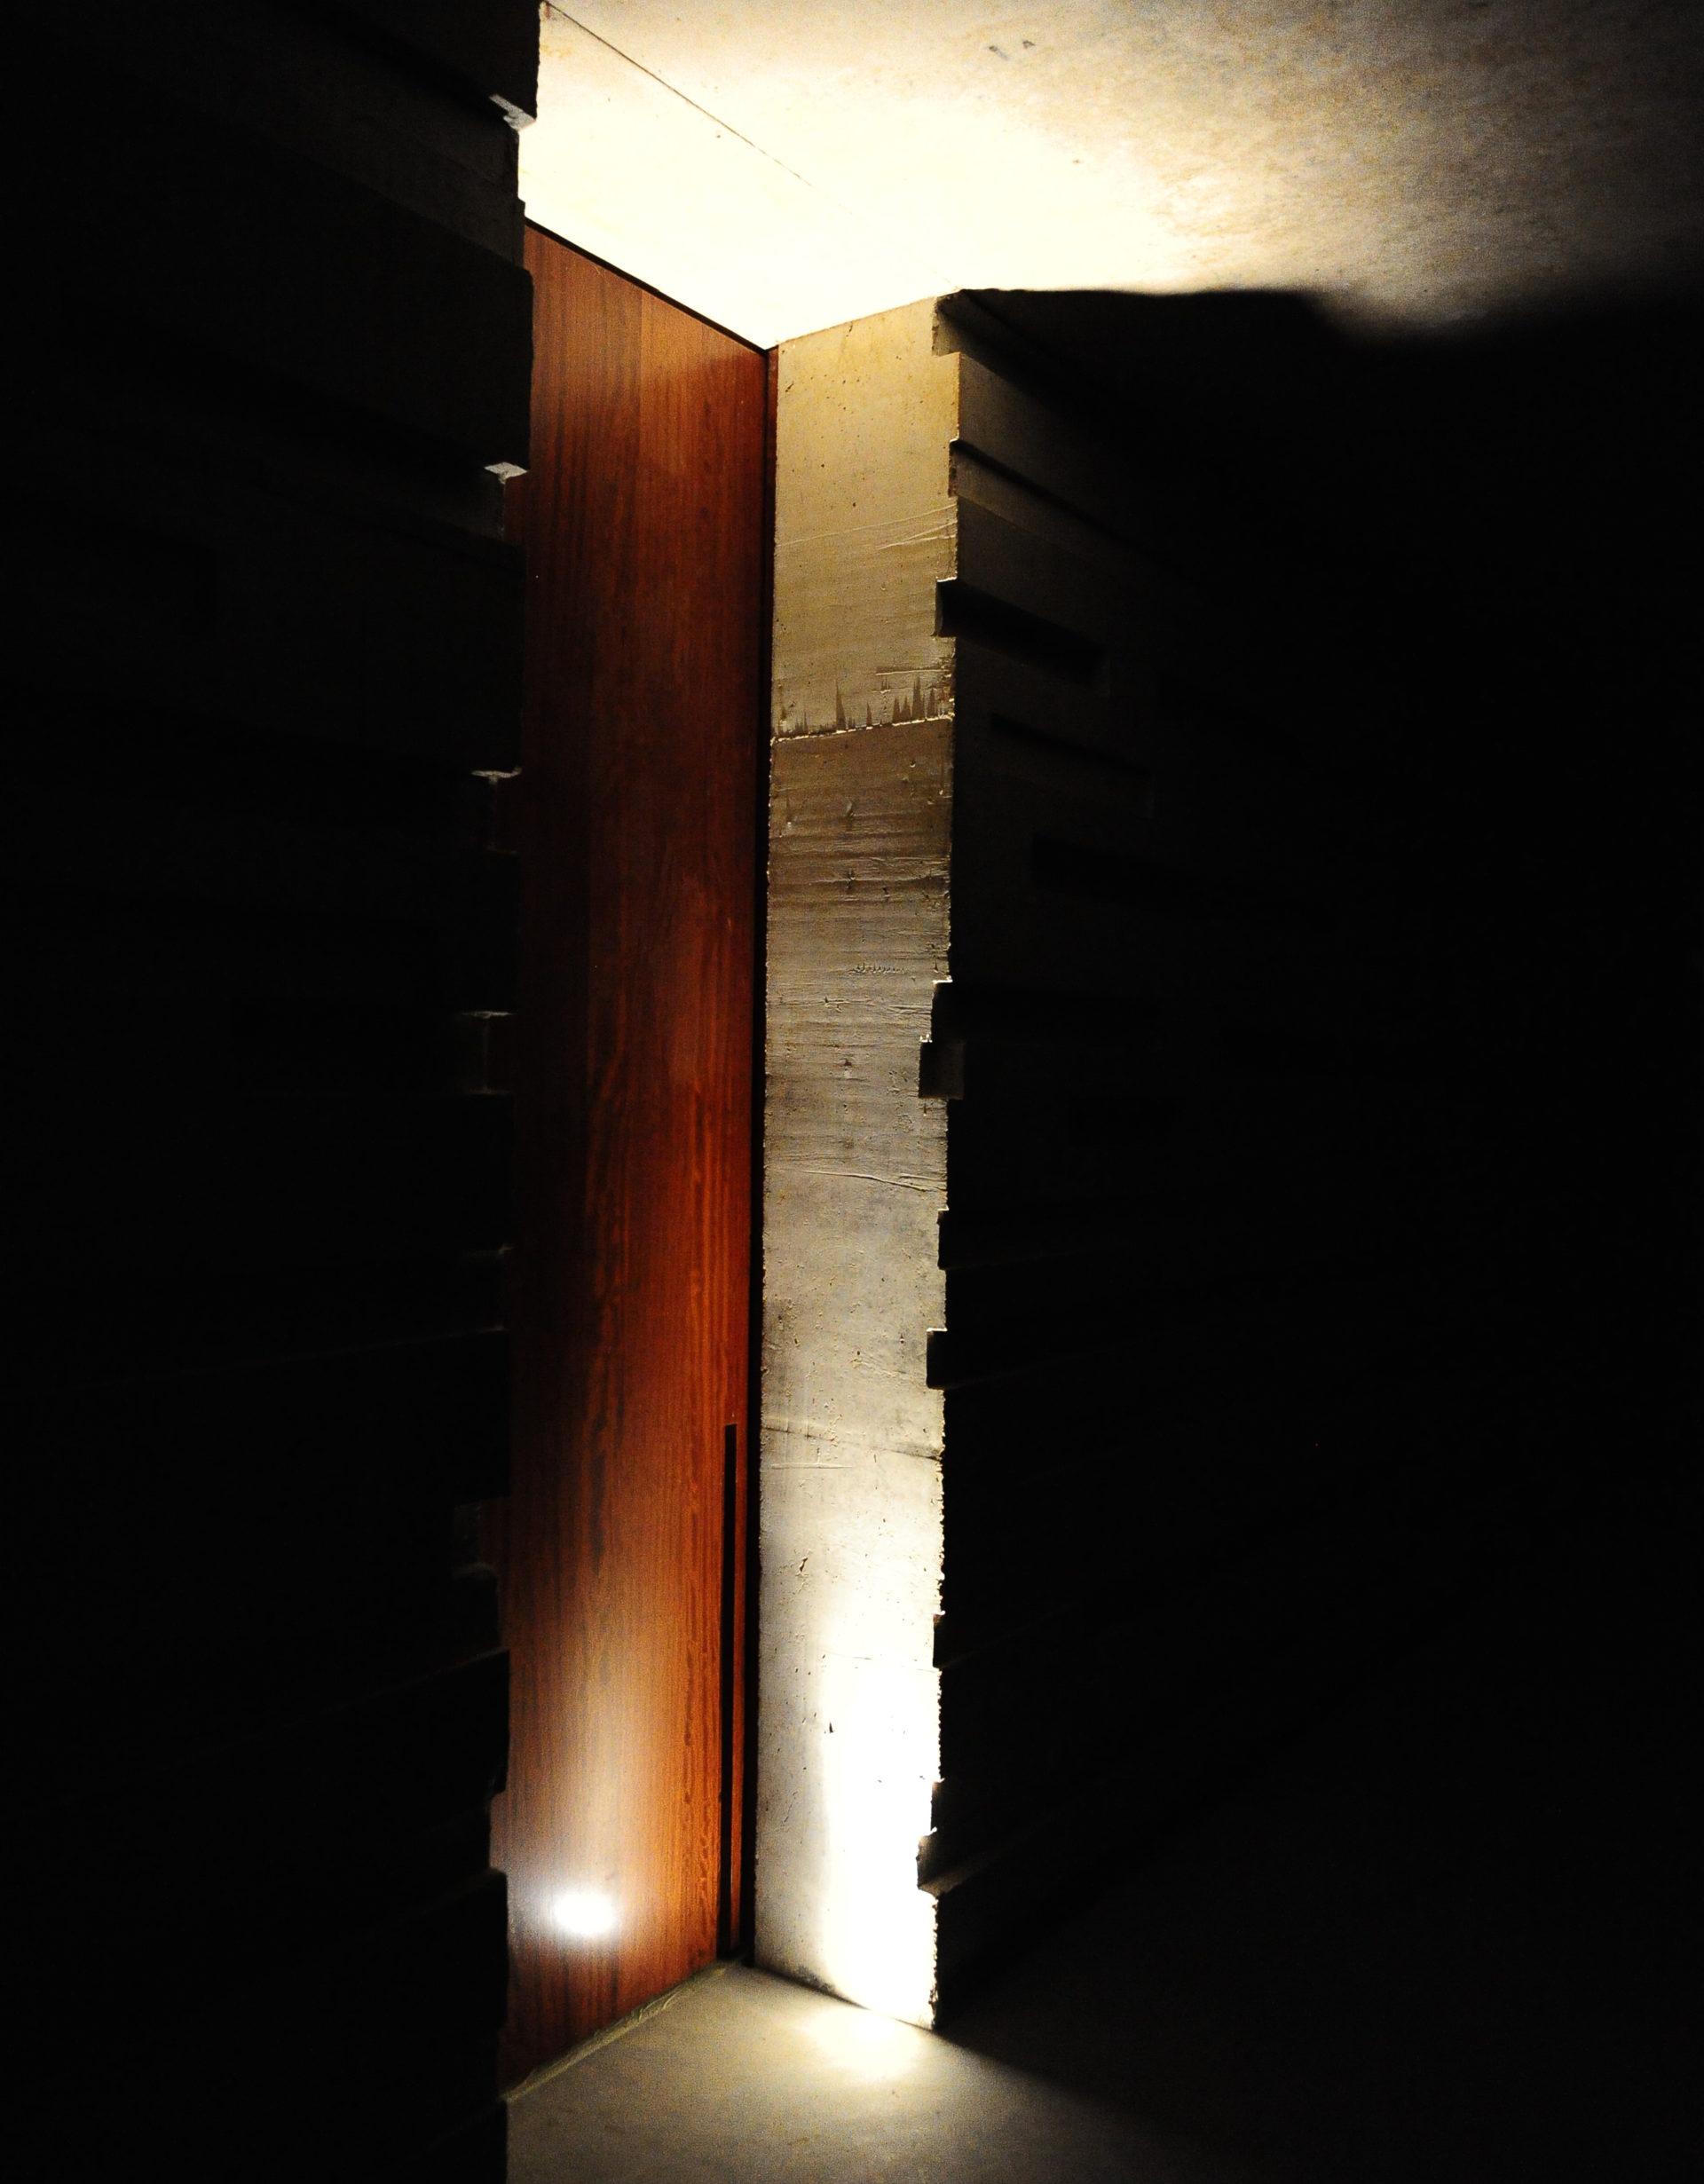 FRONT 002 de deur als autonoom object